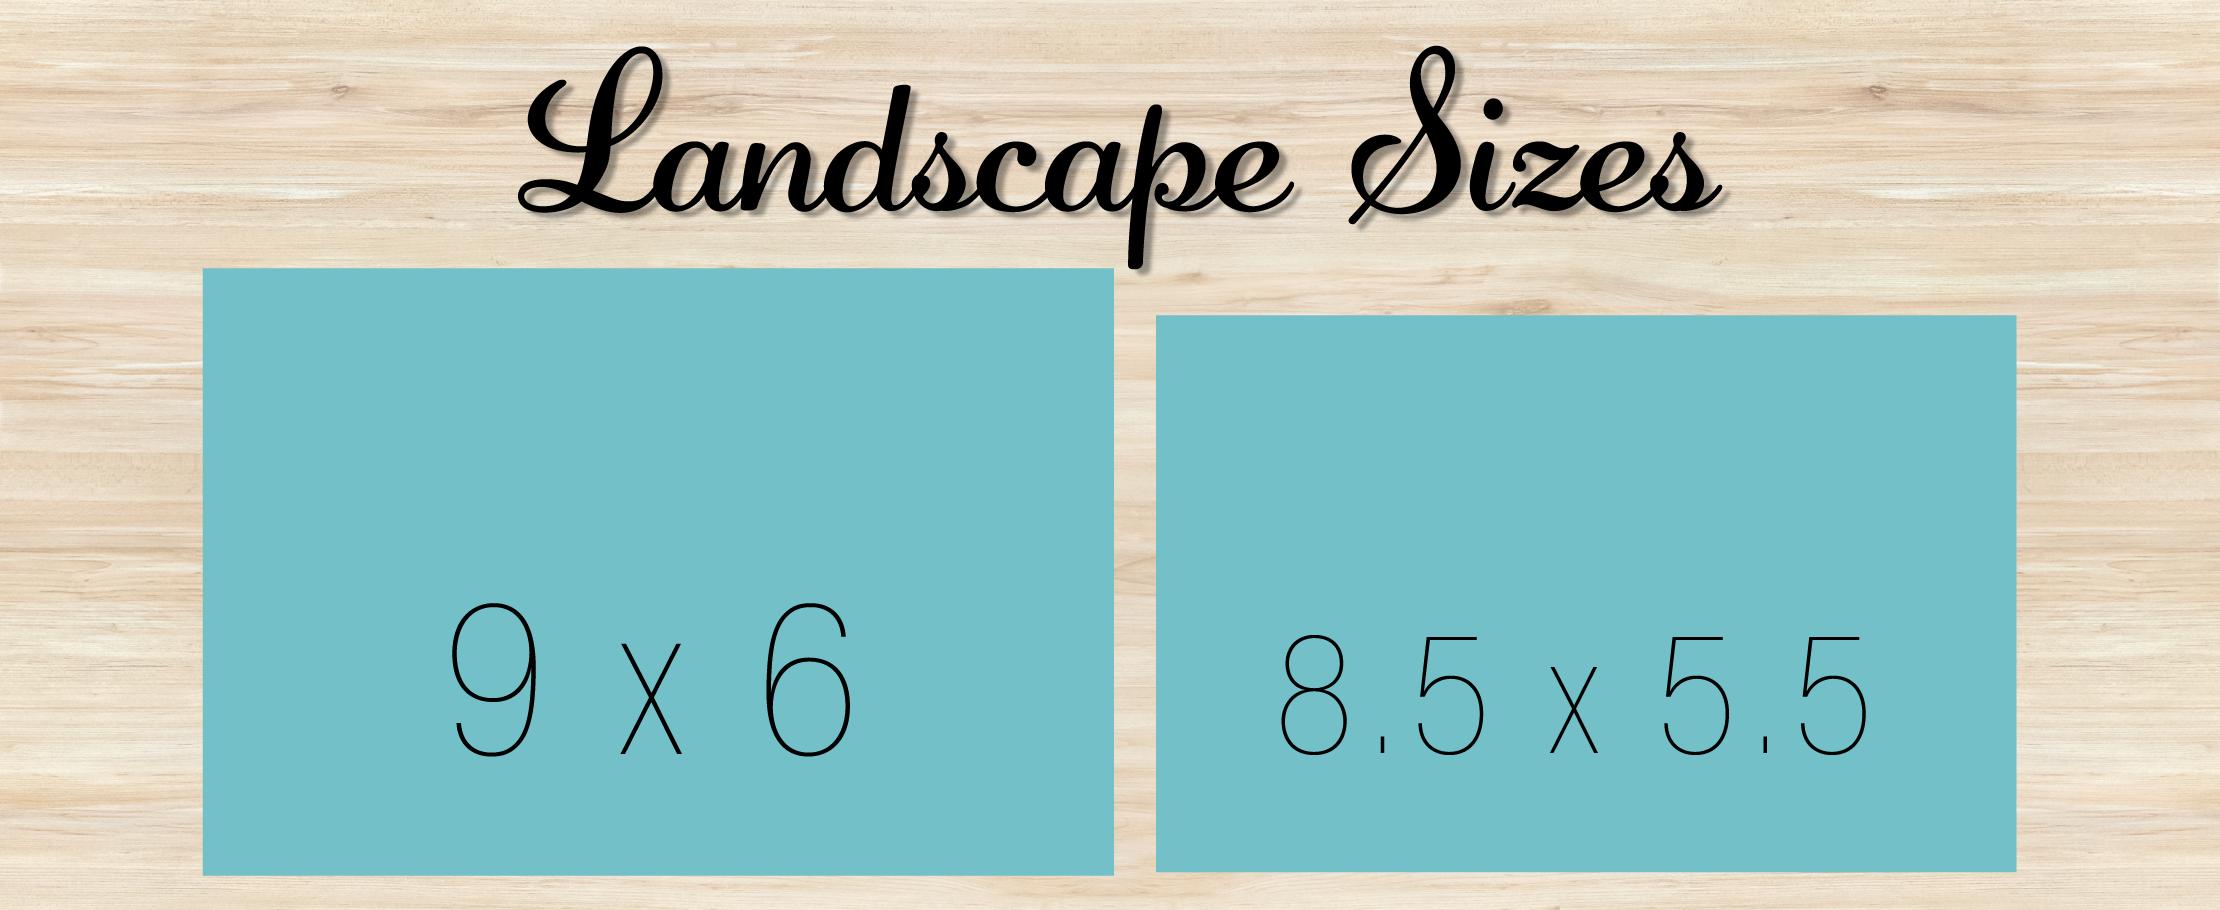 Landscapesizes.png